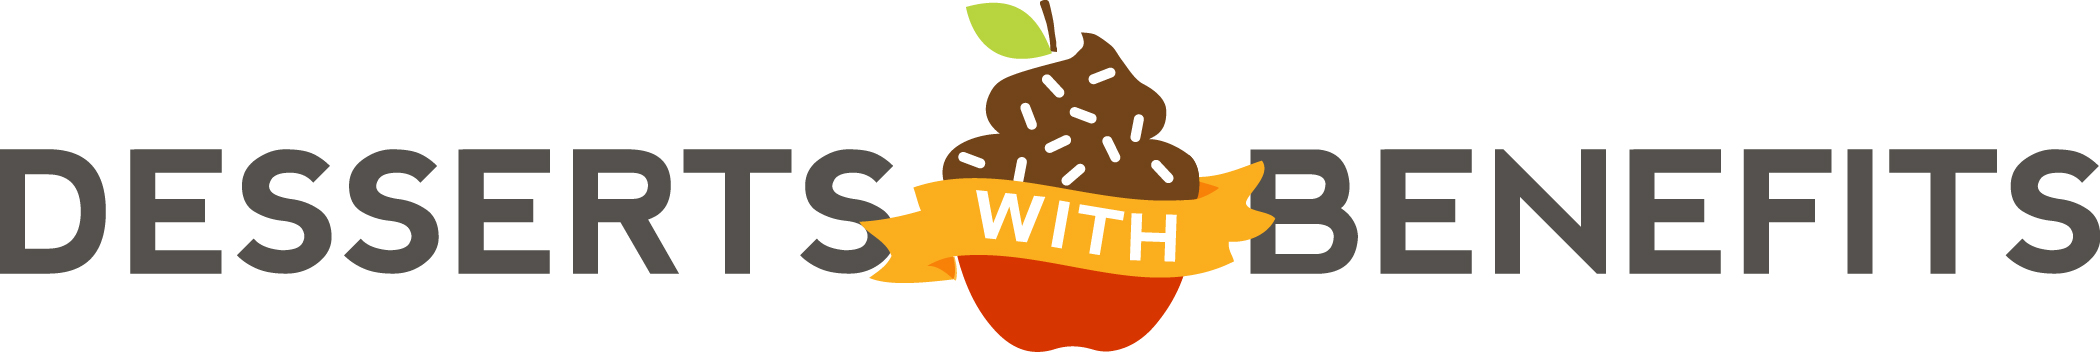 Desserts With Benefits Logo